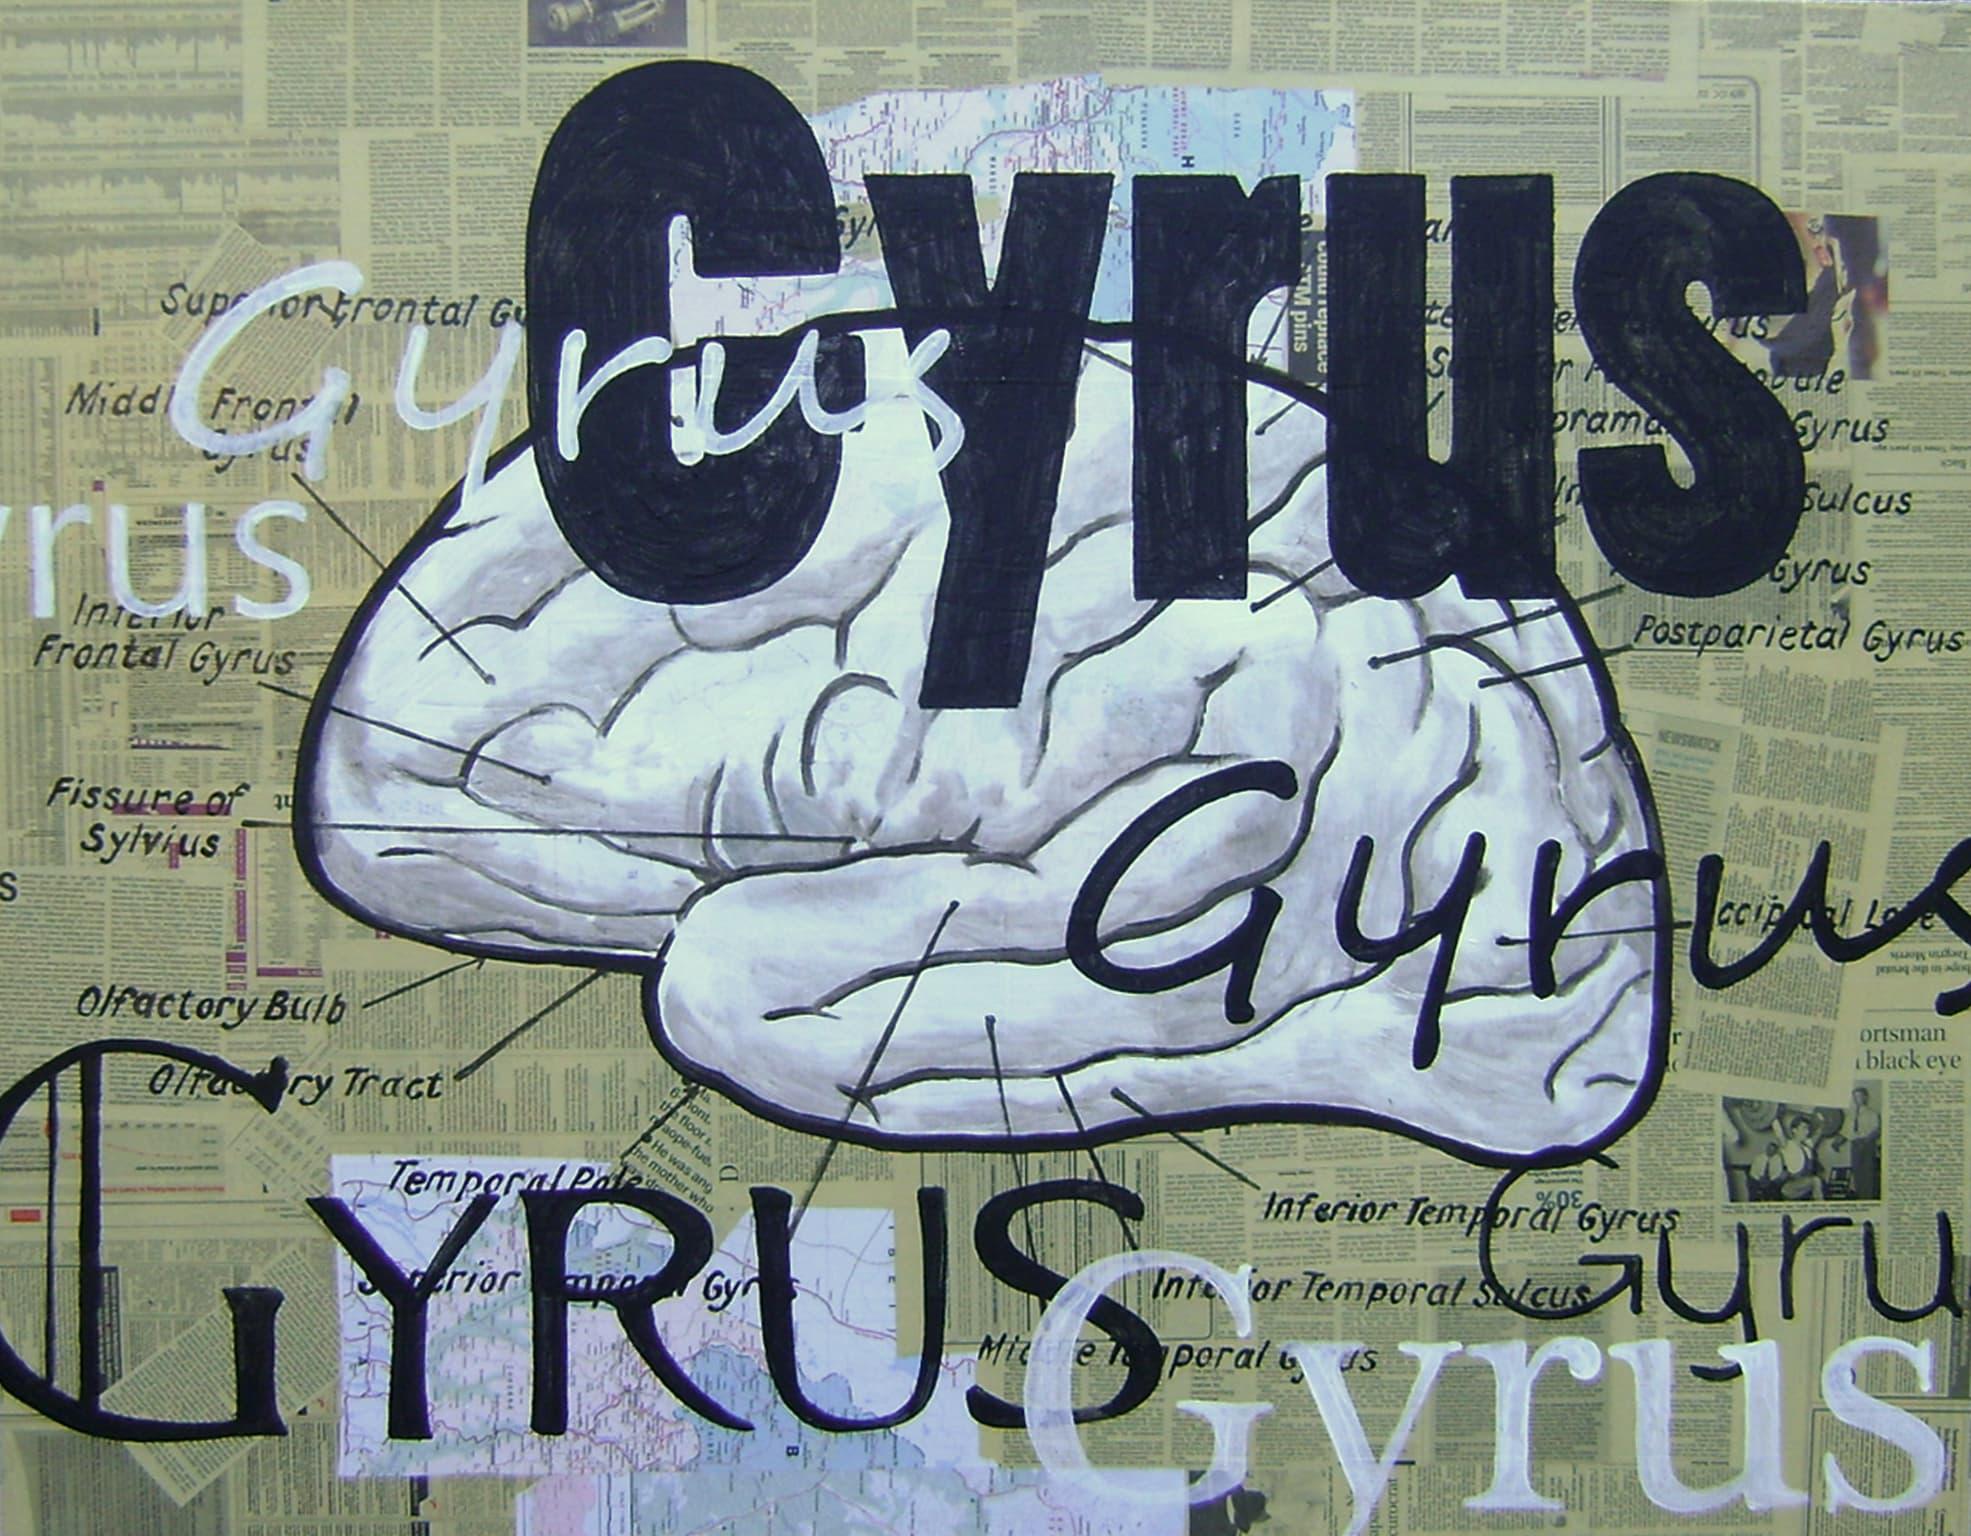 <span class=&#34;link fancybox-details-link&#34;><a href=&#34;/artists/73-sascha-%26-tashi-stylianou/works/1226-sascha-tashi-stylianou-gyrus-2015/&#34;>View Detail Page</a></span><div class=&#34;artist&#34;><strong>Sascha & Tashi Stylianou</strong></div> <div class=&#34;title&#34;><em>Gyrus </em>, 2015</div> <div class=&#34;medium&#34;>Mixed Media On Canvas</div> <div class=&#34;dimensions&#34;>101.5cm x 128cm</div><div class=&#34;price&#34;>R12,500.00</div>